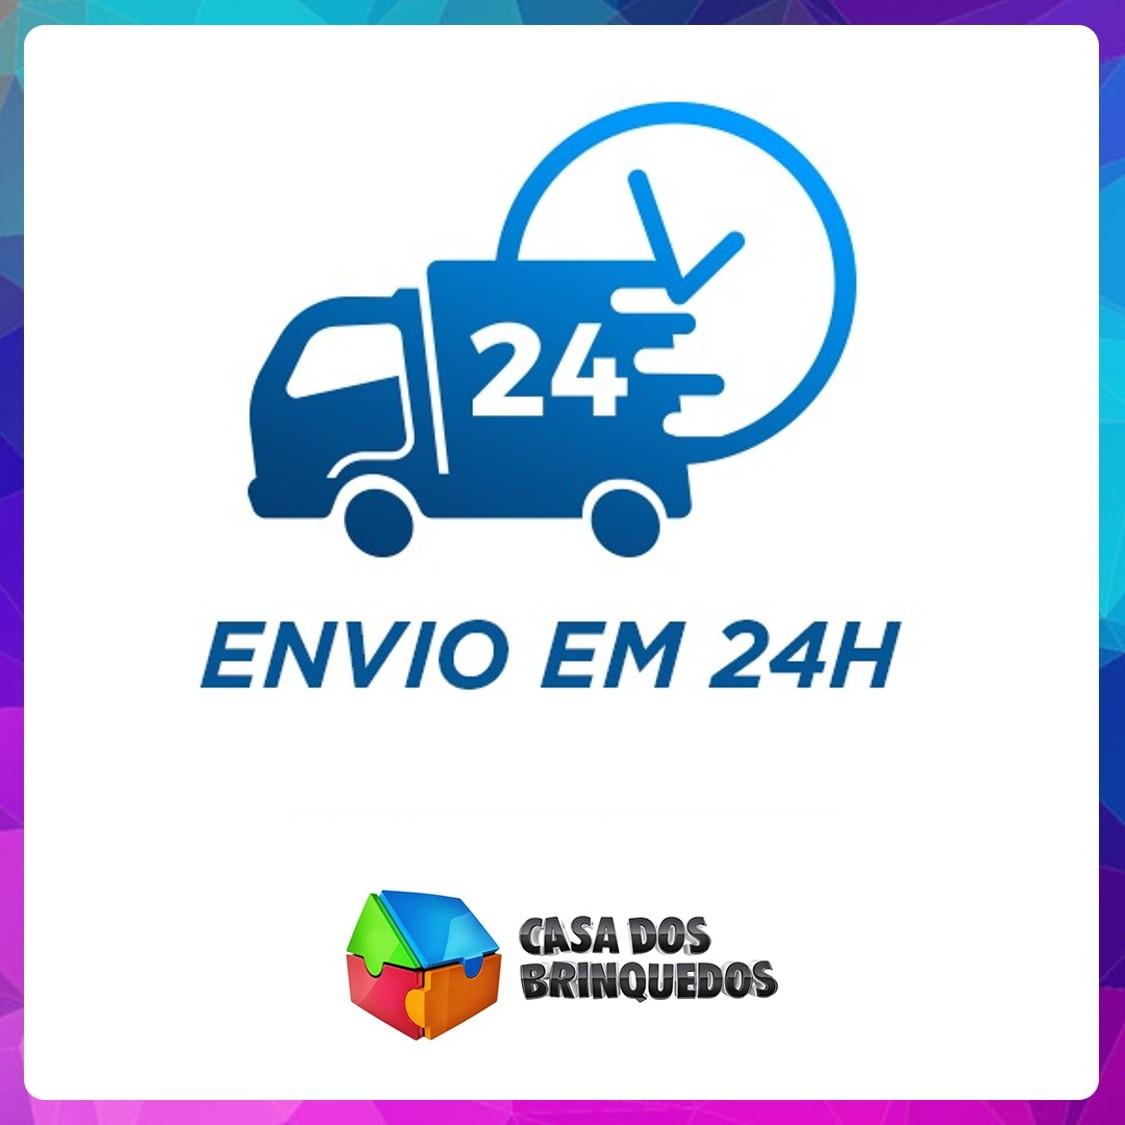 CARRO DE CONTROLE REMOTO WEB CLIMBER SPIDERMAN 5854 CANDIDE